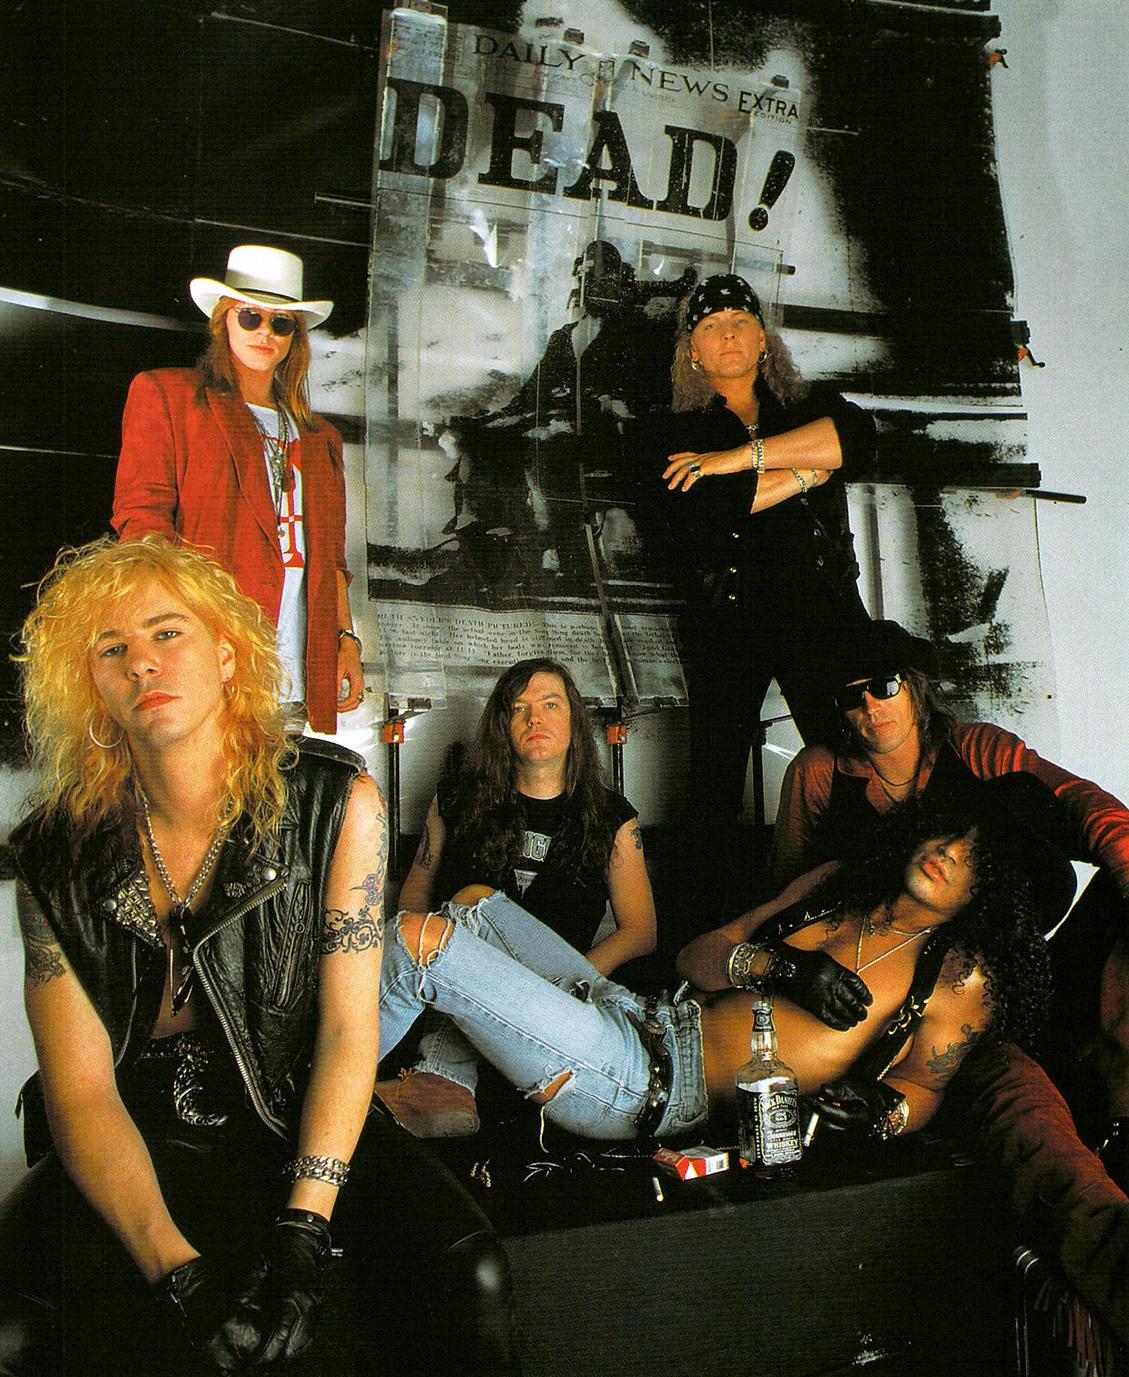 hennemusic: Guns N' Roses reunion rumours heat up